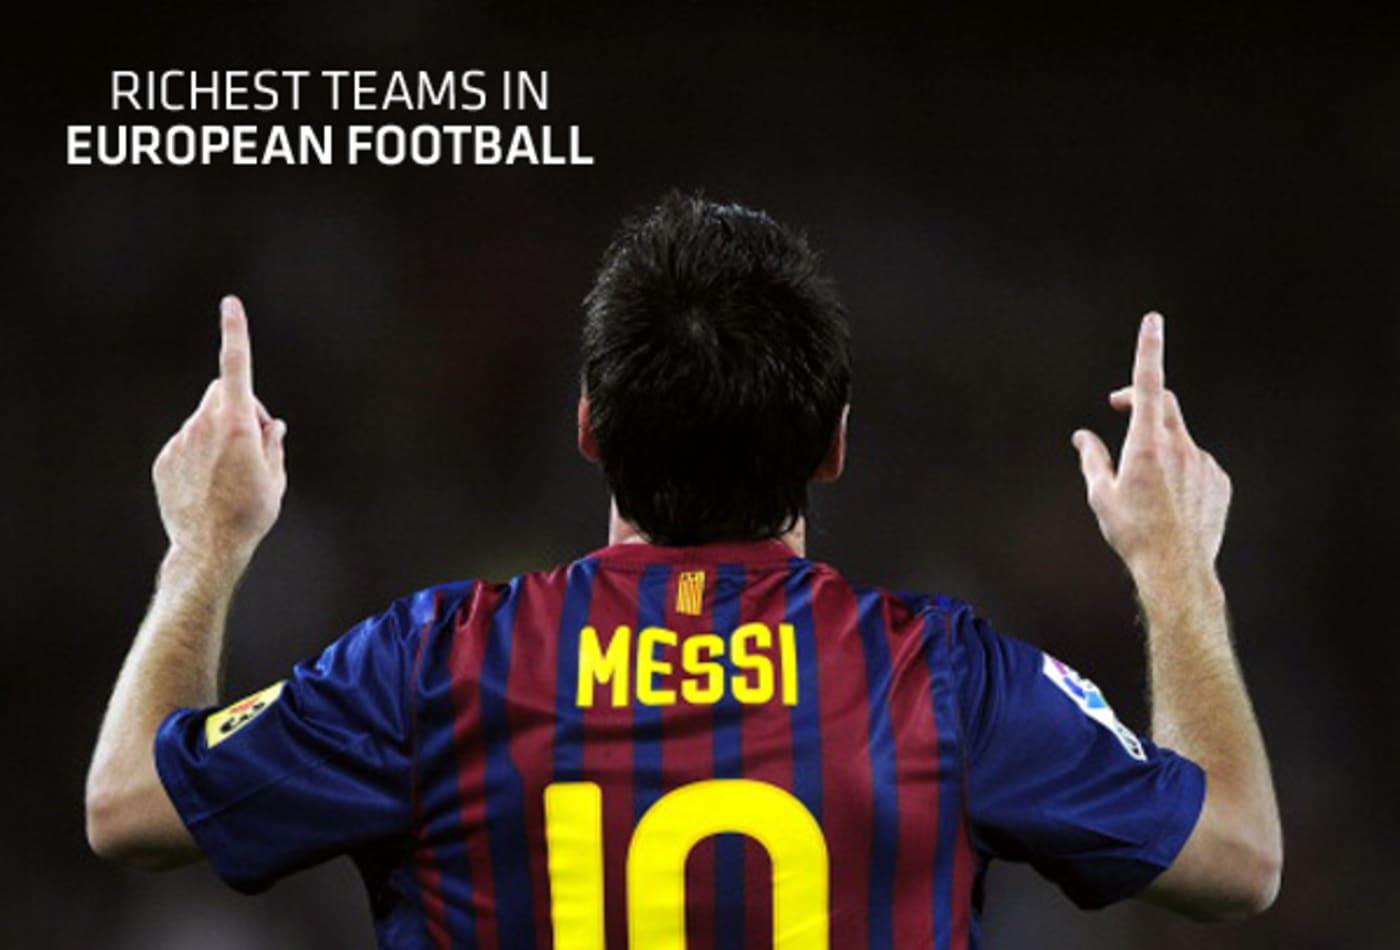 727ec936c7d Highest-Earning Soccer Clubs. CNBC rich teams euro football cover.jpg